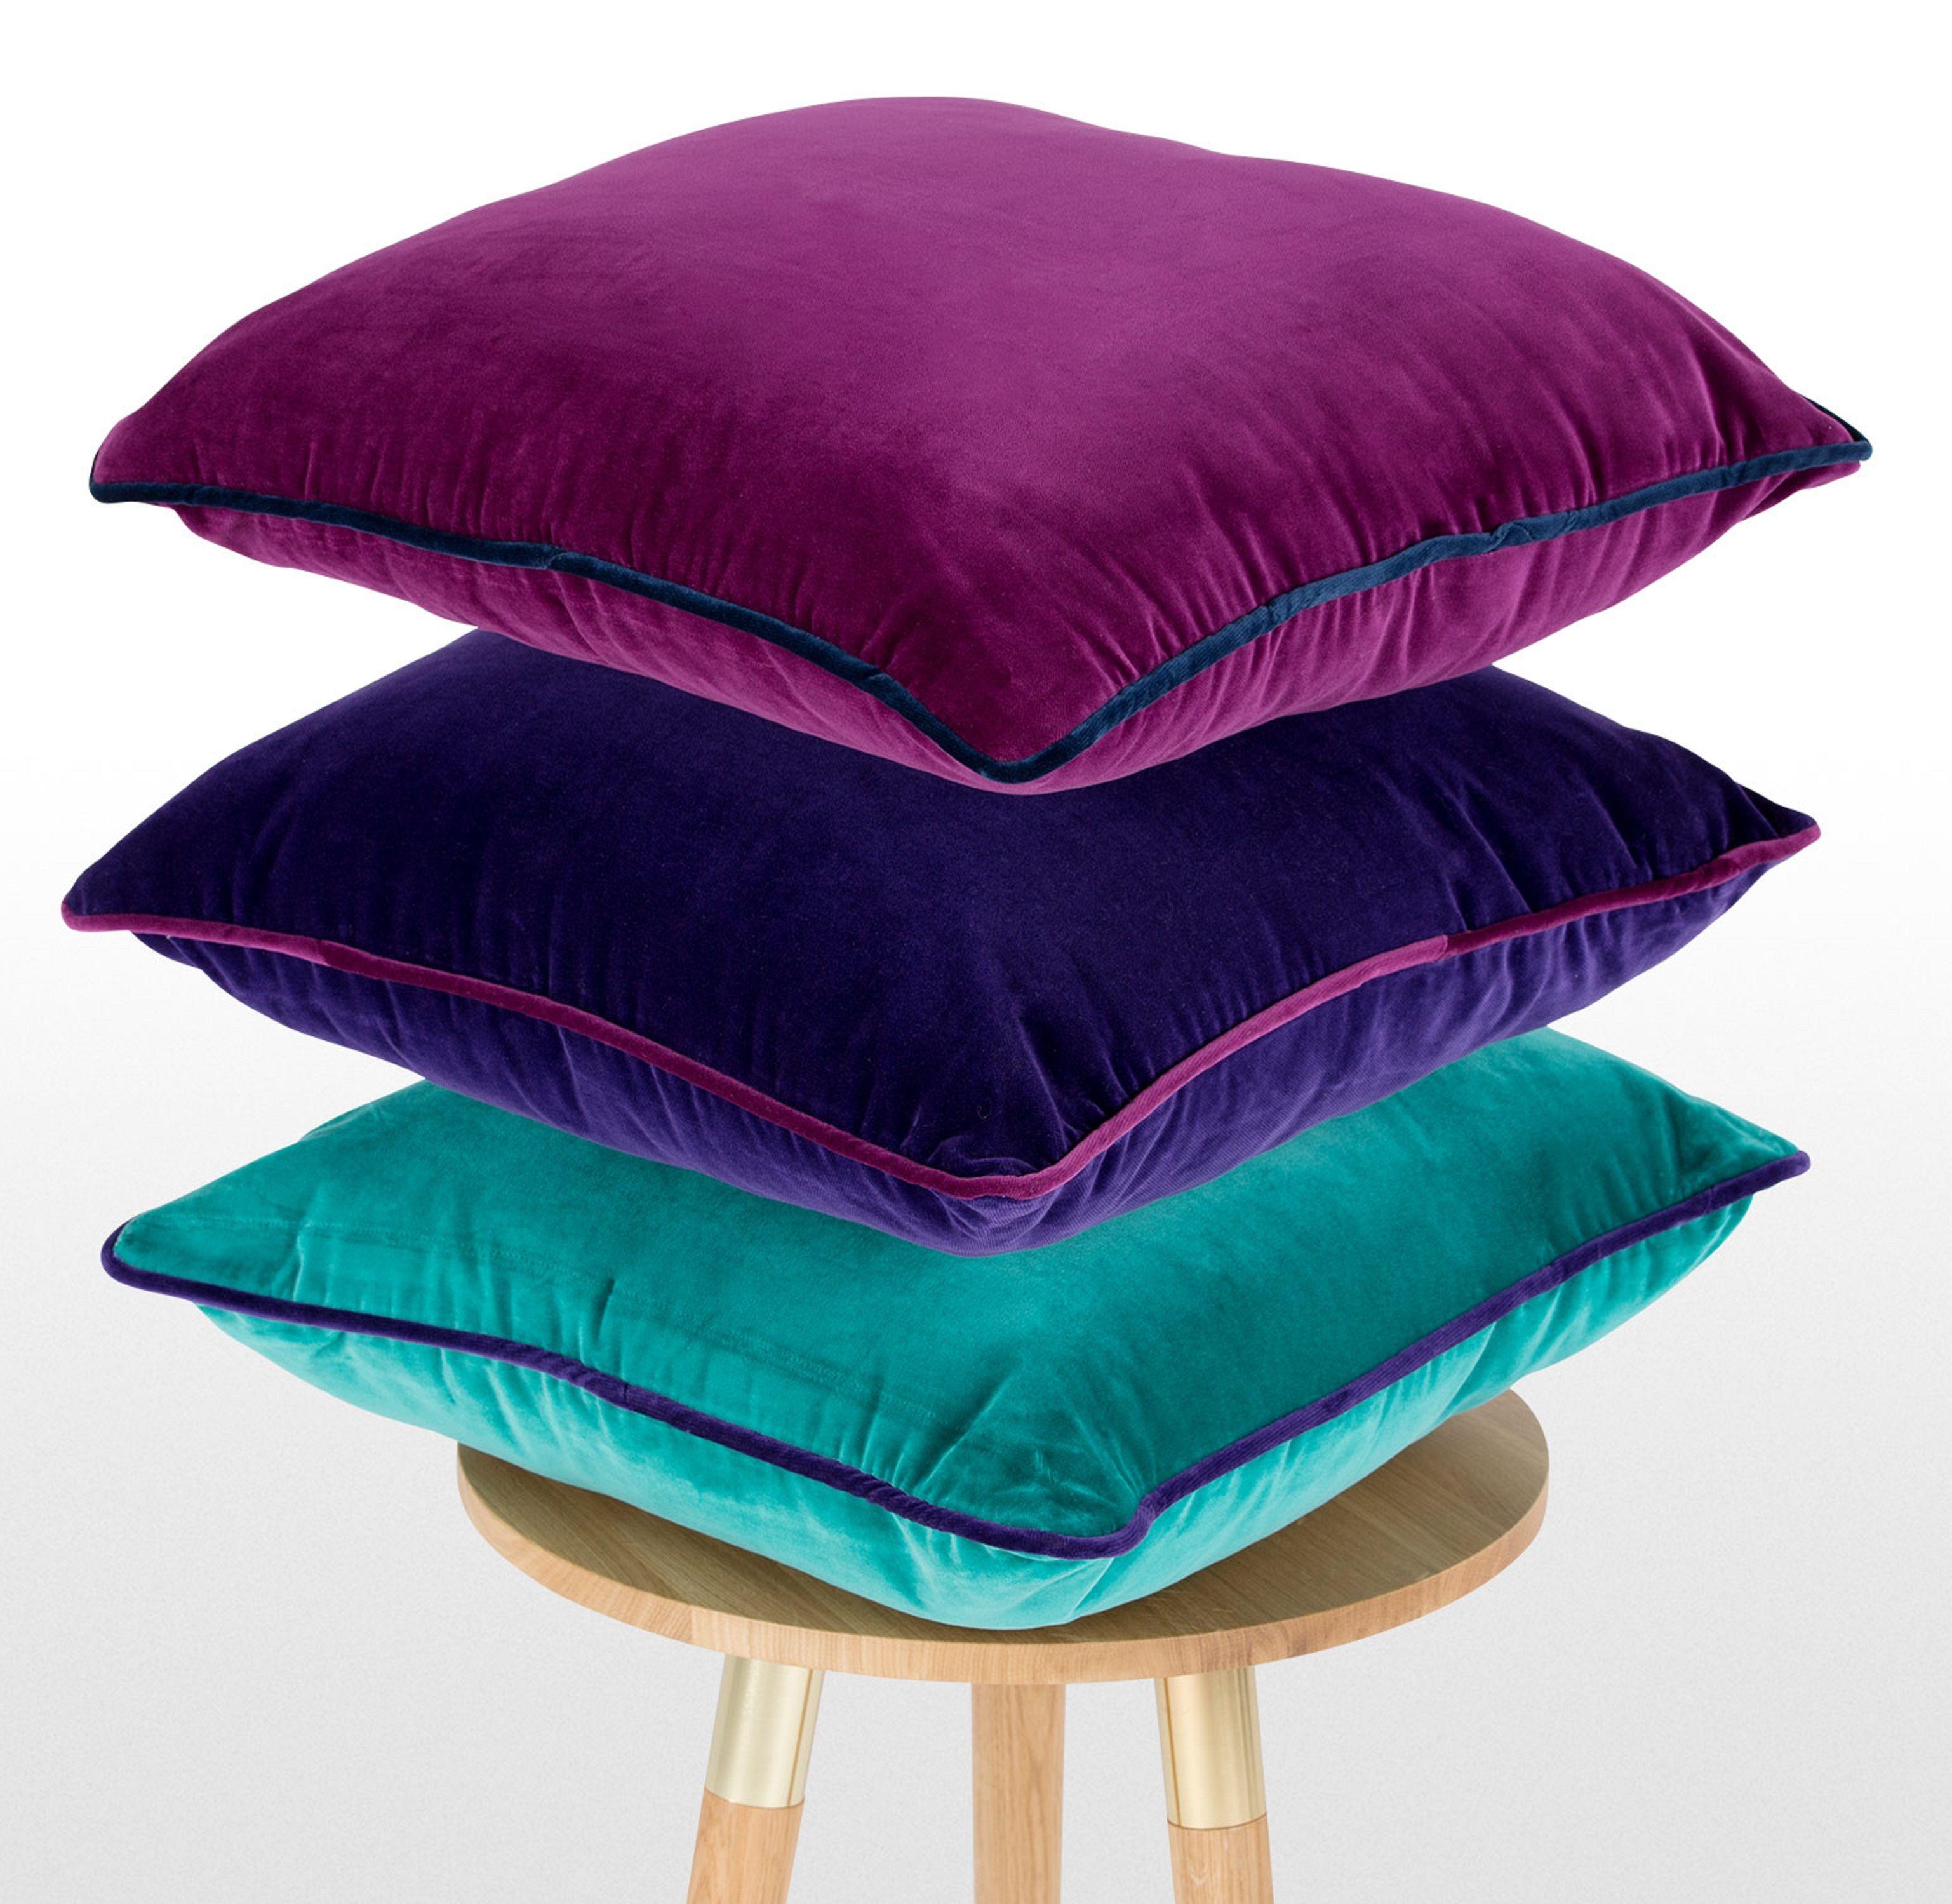 Mya Cotton Velvet Cushion 50cm x 50cm Plum with Purple Piping Mya